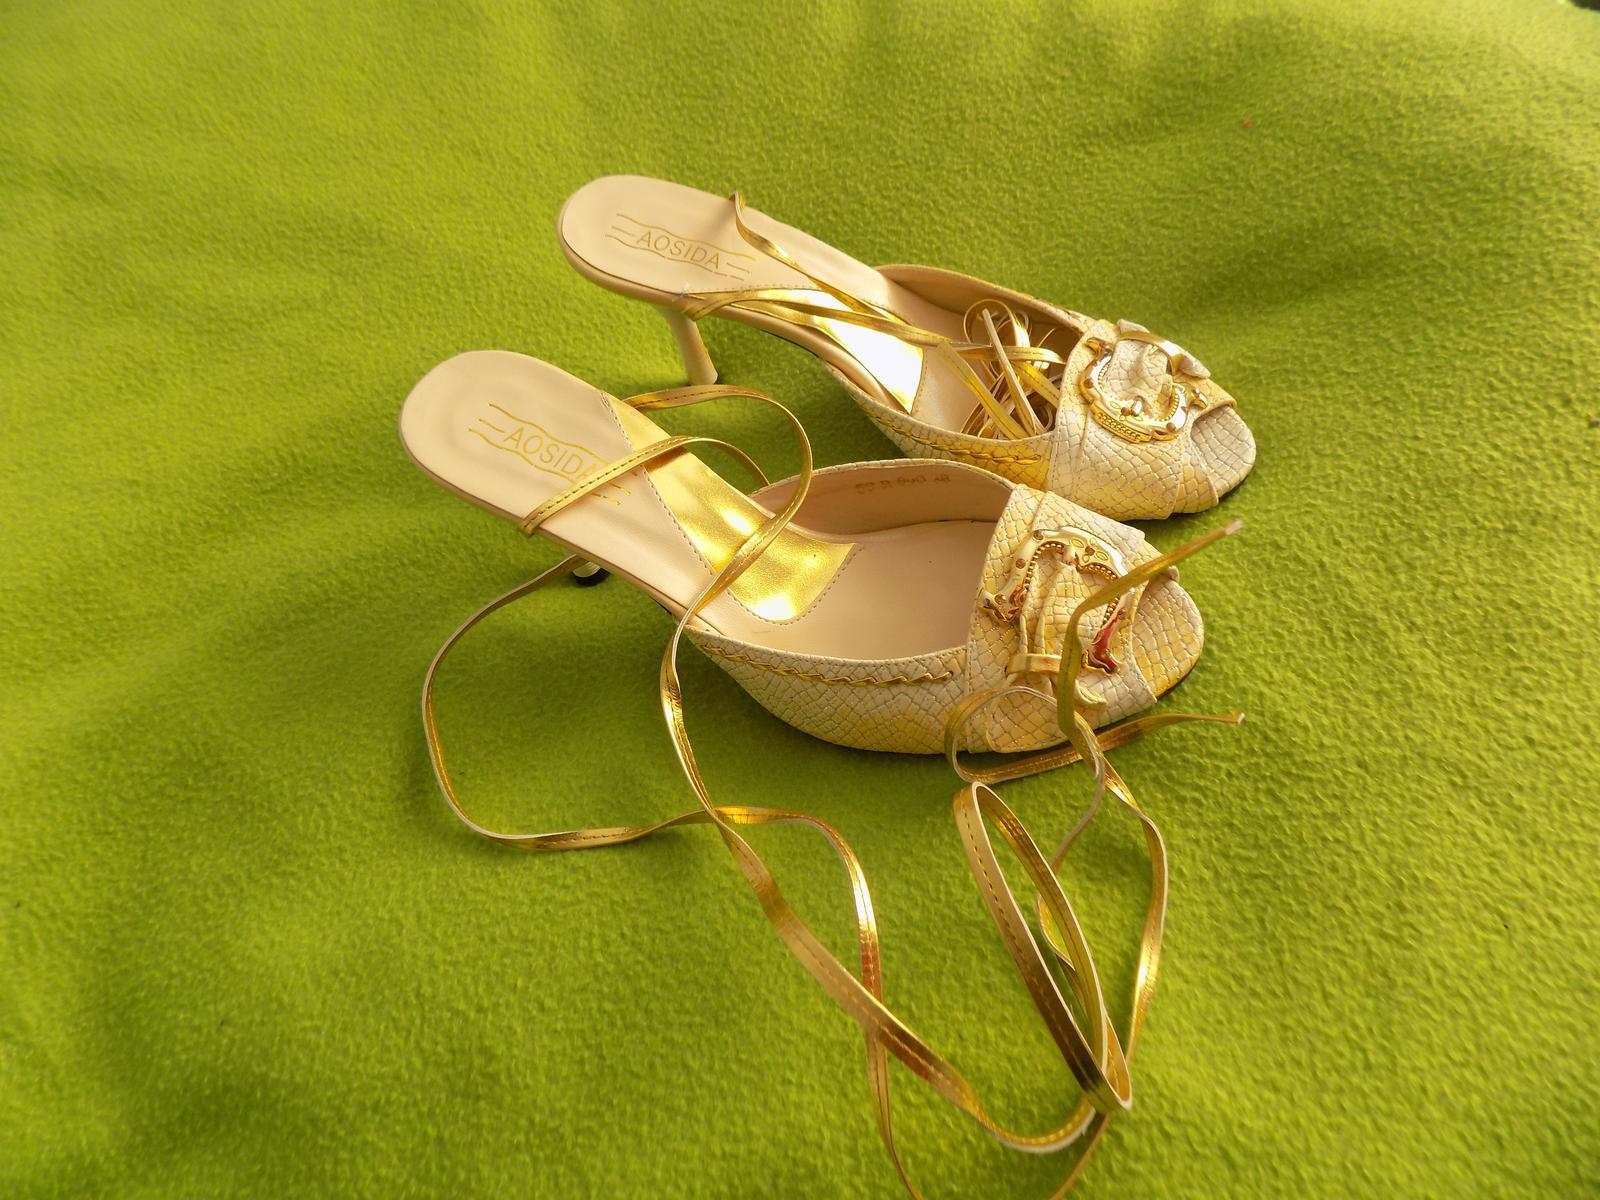 Zlaté new sandálky - Obrázok č. 1